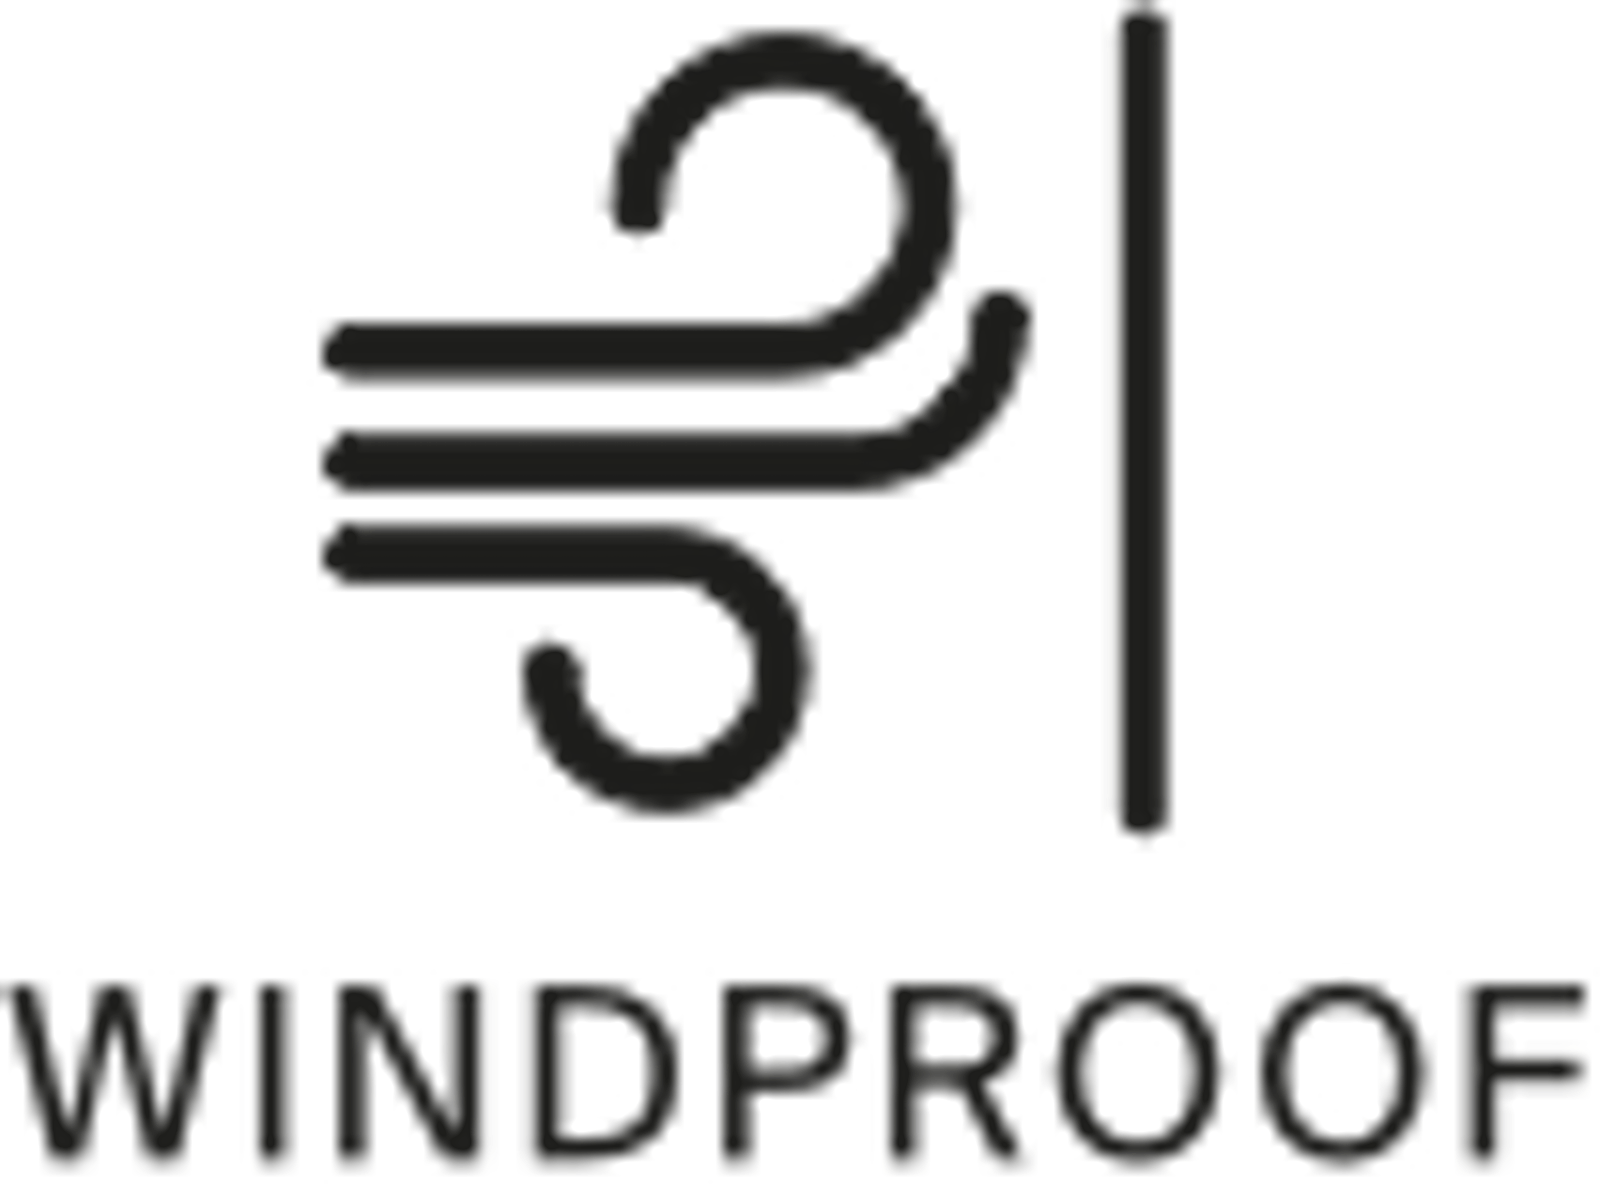 Windproof certification